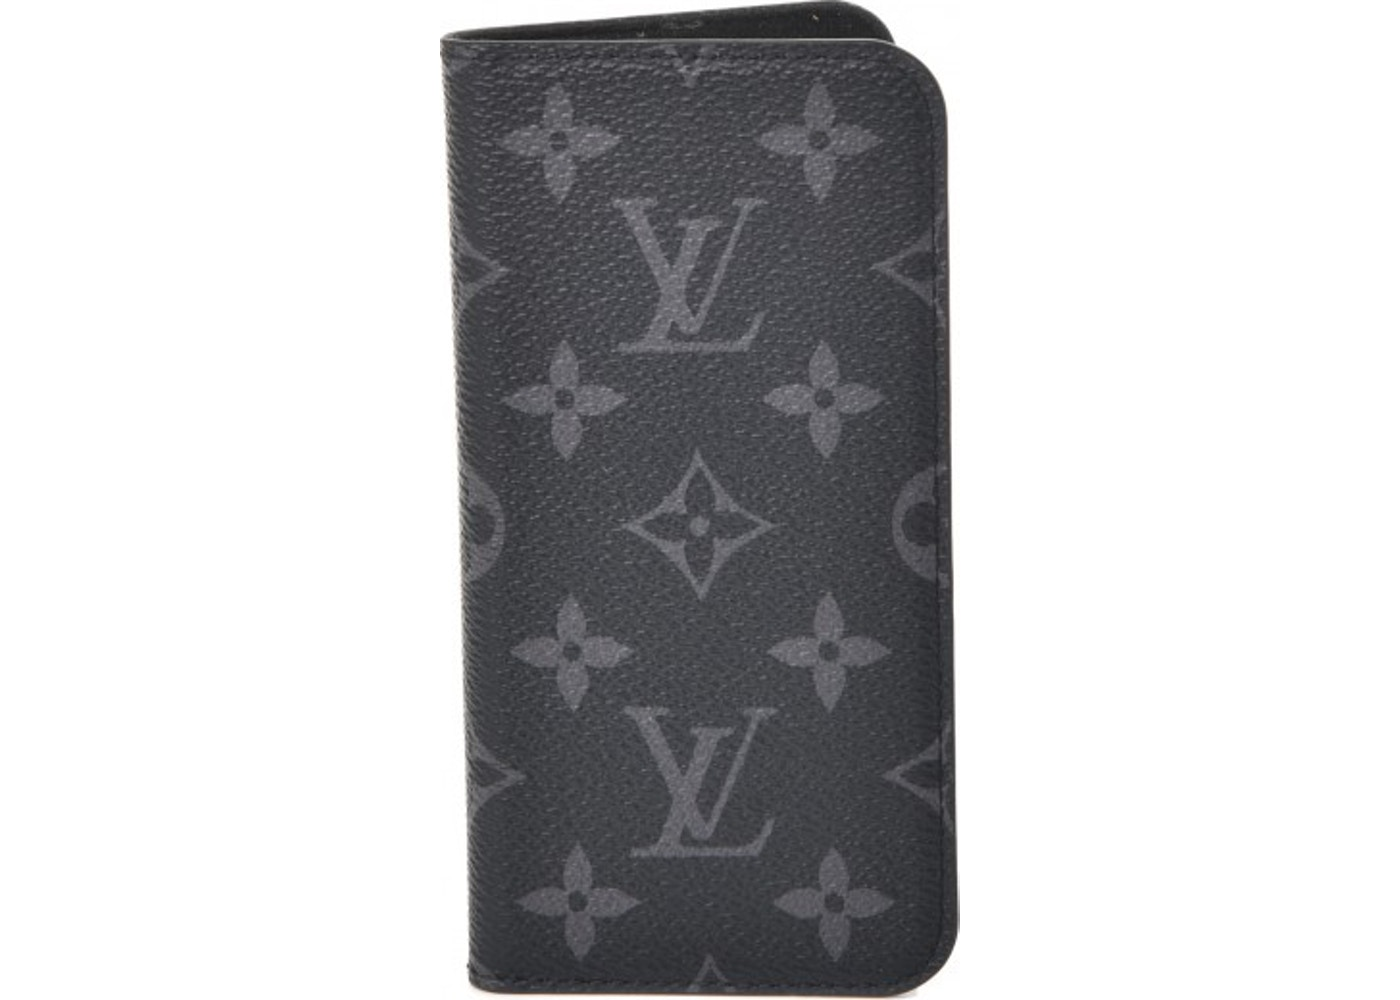 sale retailer e28c1 02579 Louis Vuitton Folio Case iPhone X Monogram Eclipse Gray/Black